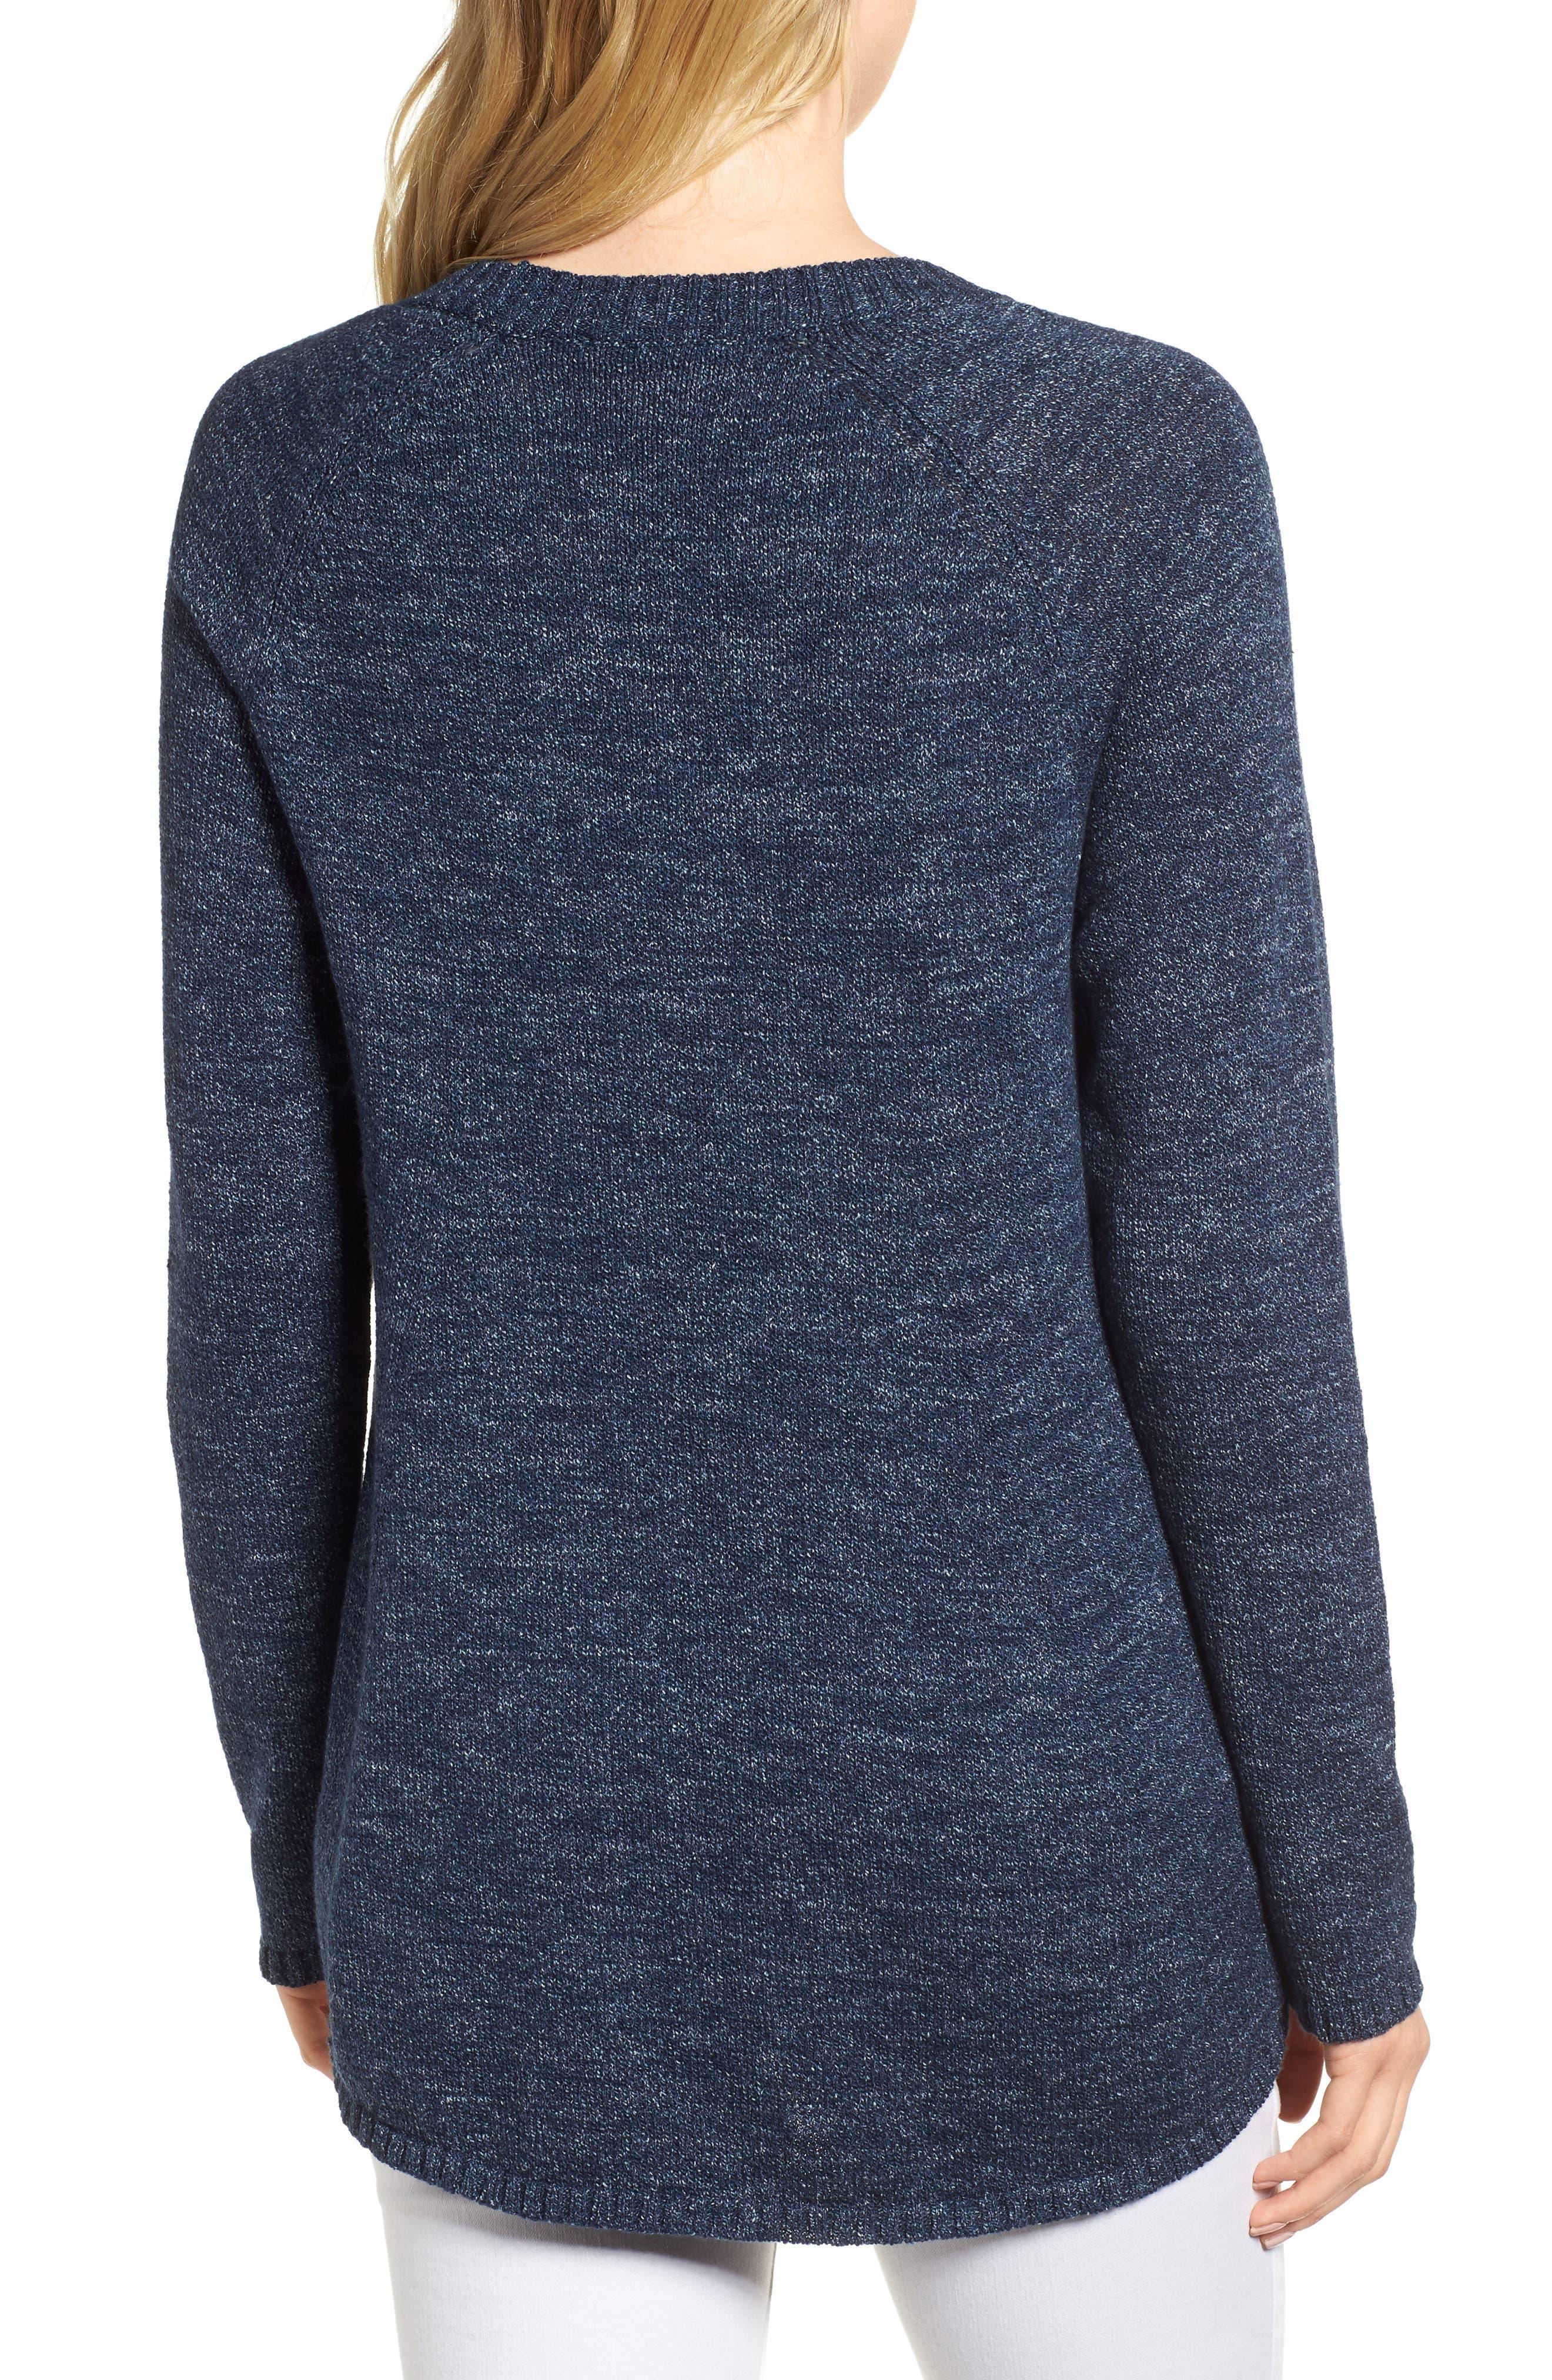 Organic Cotton Sweater,                             Alternate thumbnail 2, color,                             480